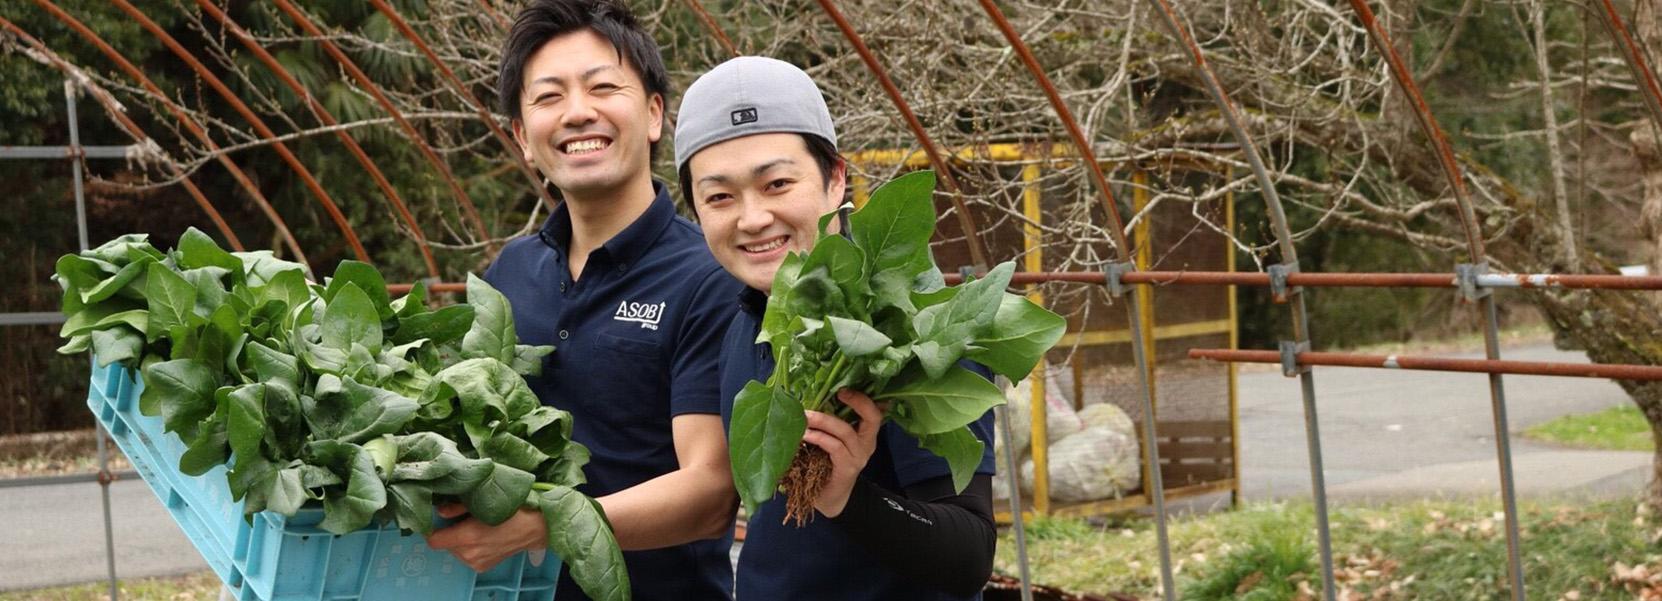 AGURInet - 若手農家の農業情報ポータルサイト